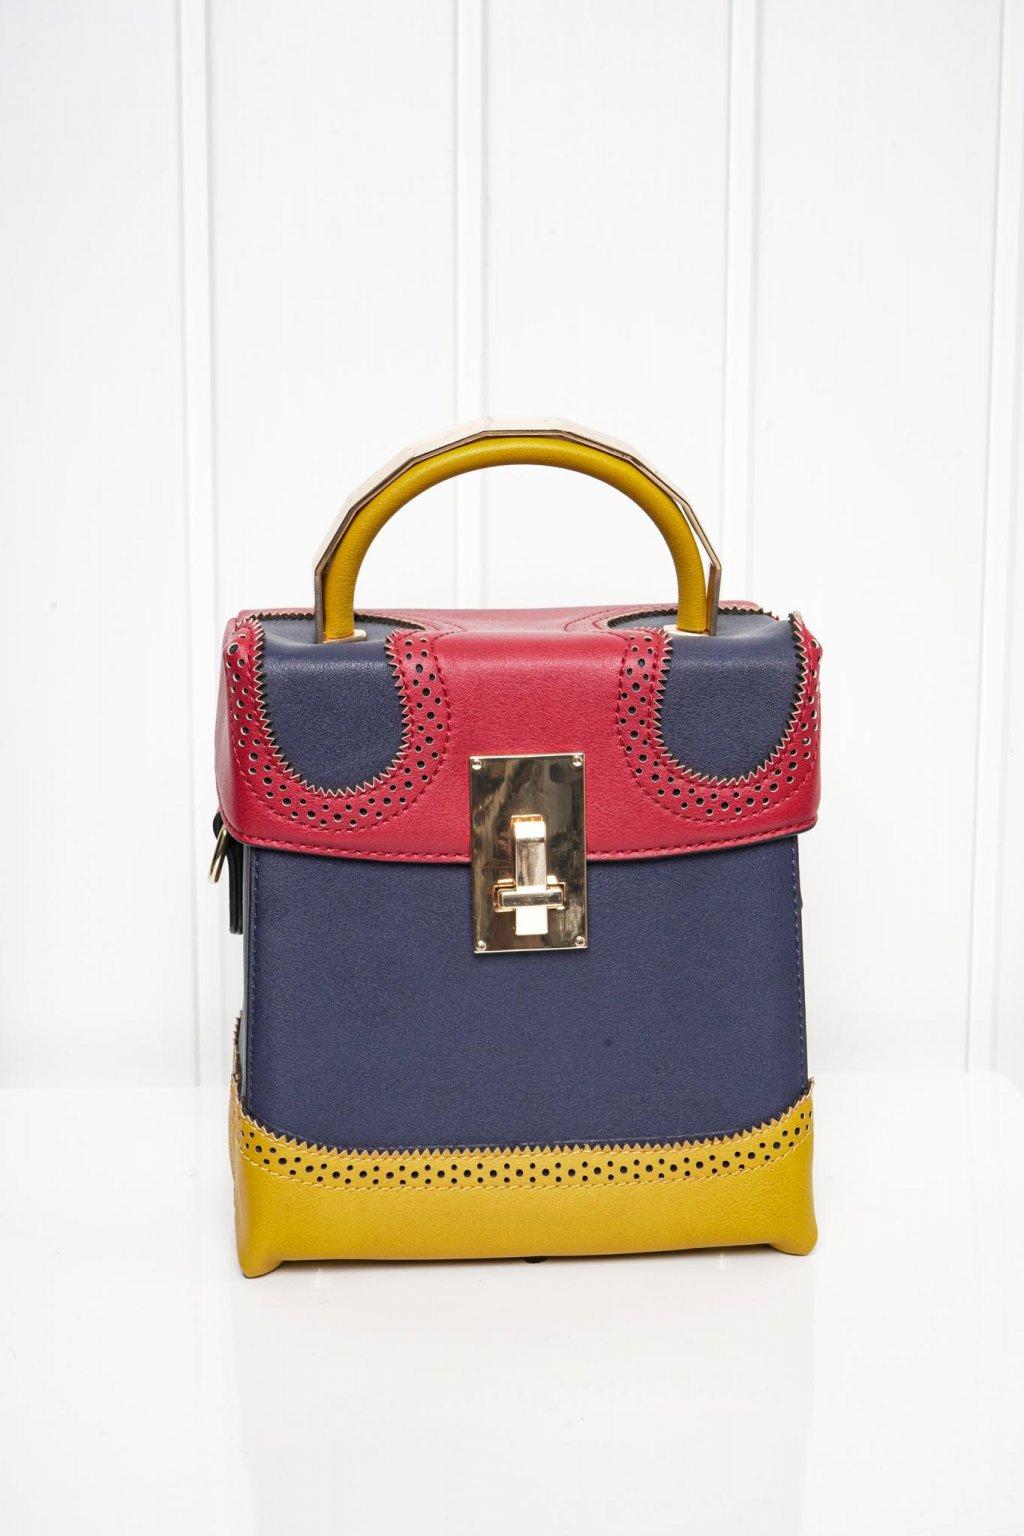 Kabelka, crossbody, ruksak, shopping bag, shopperka, 504